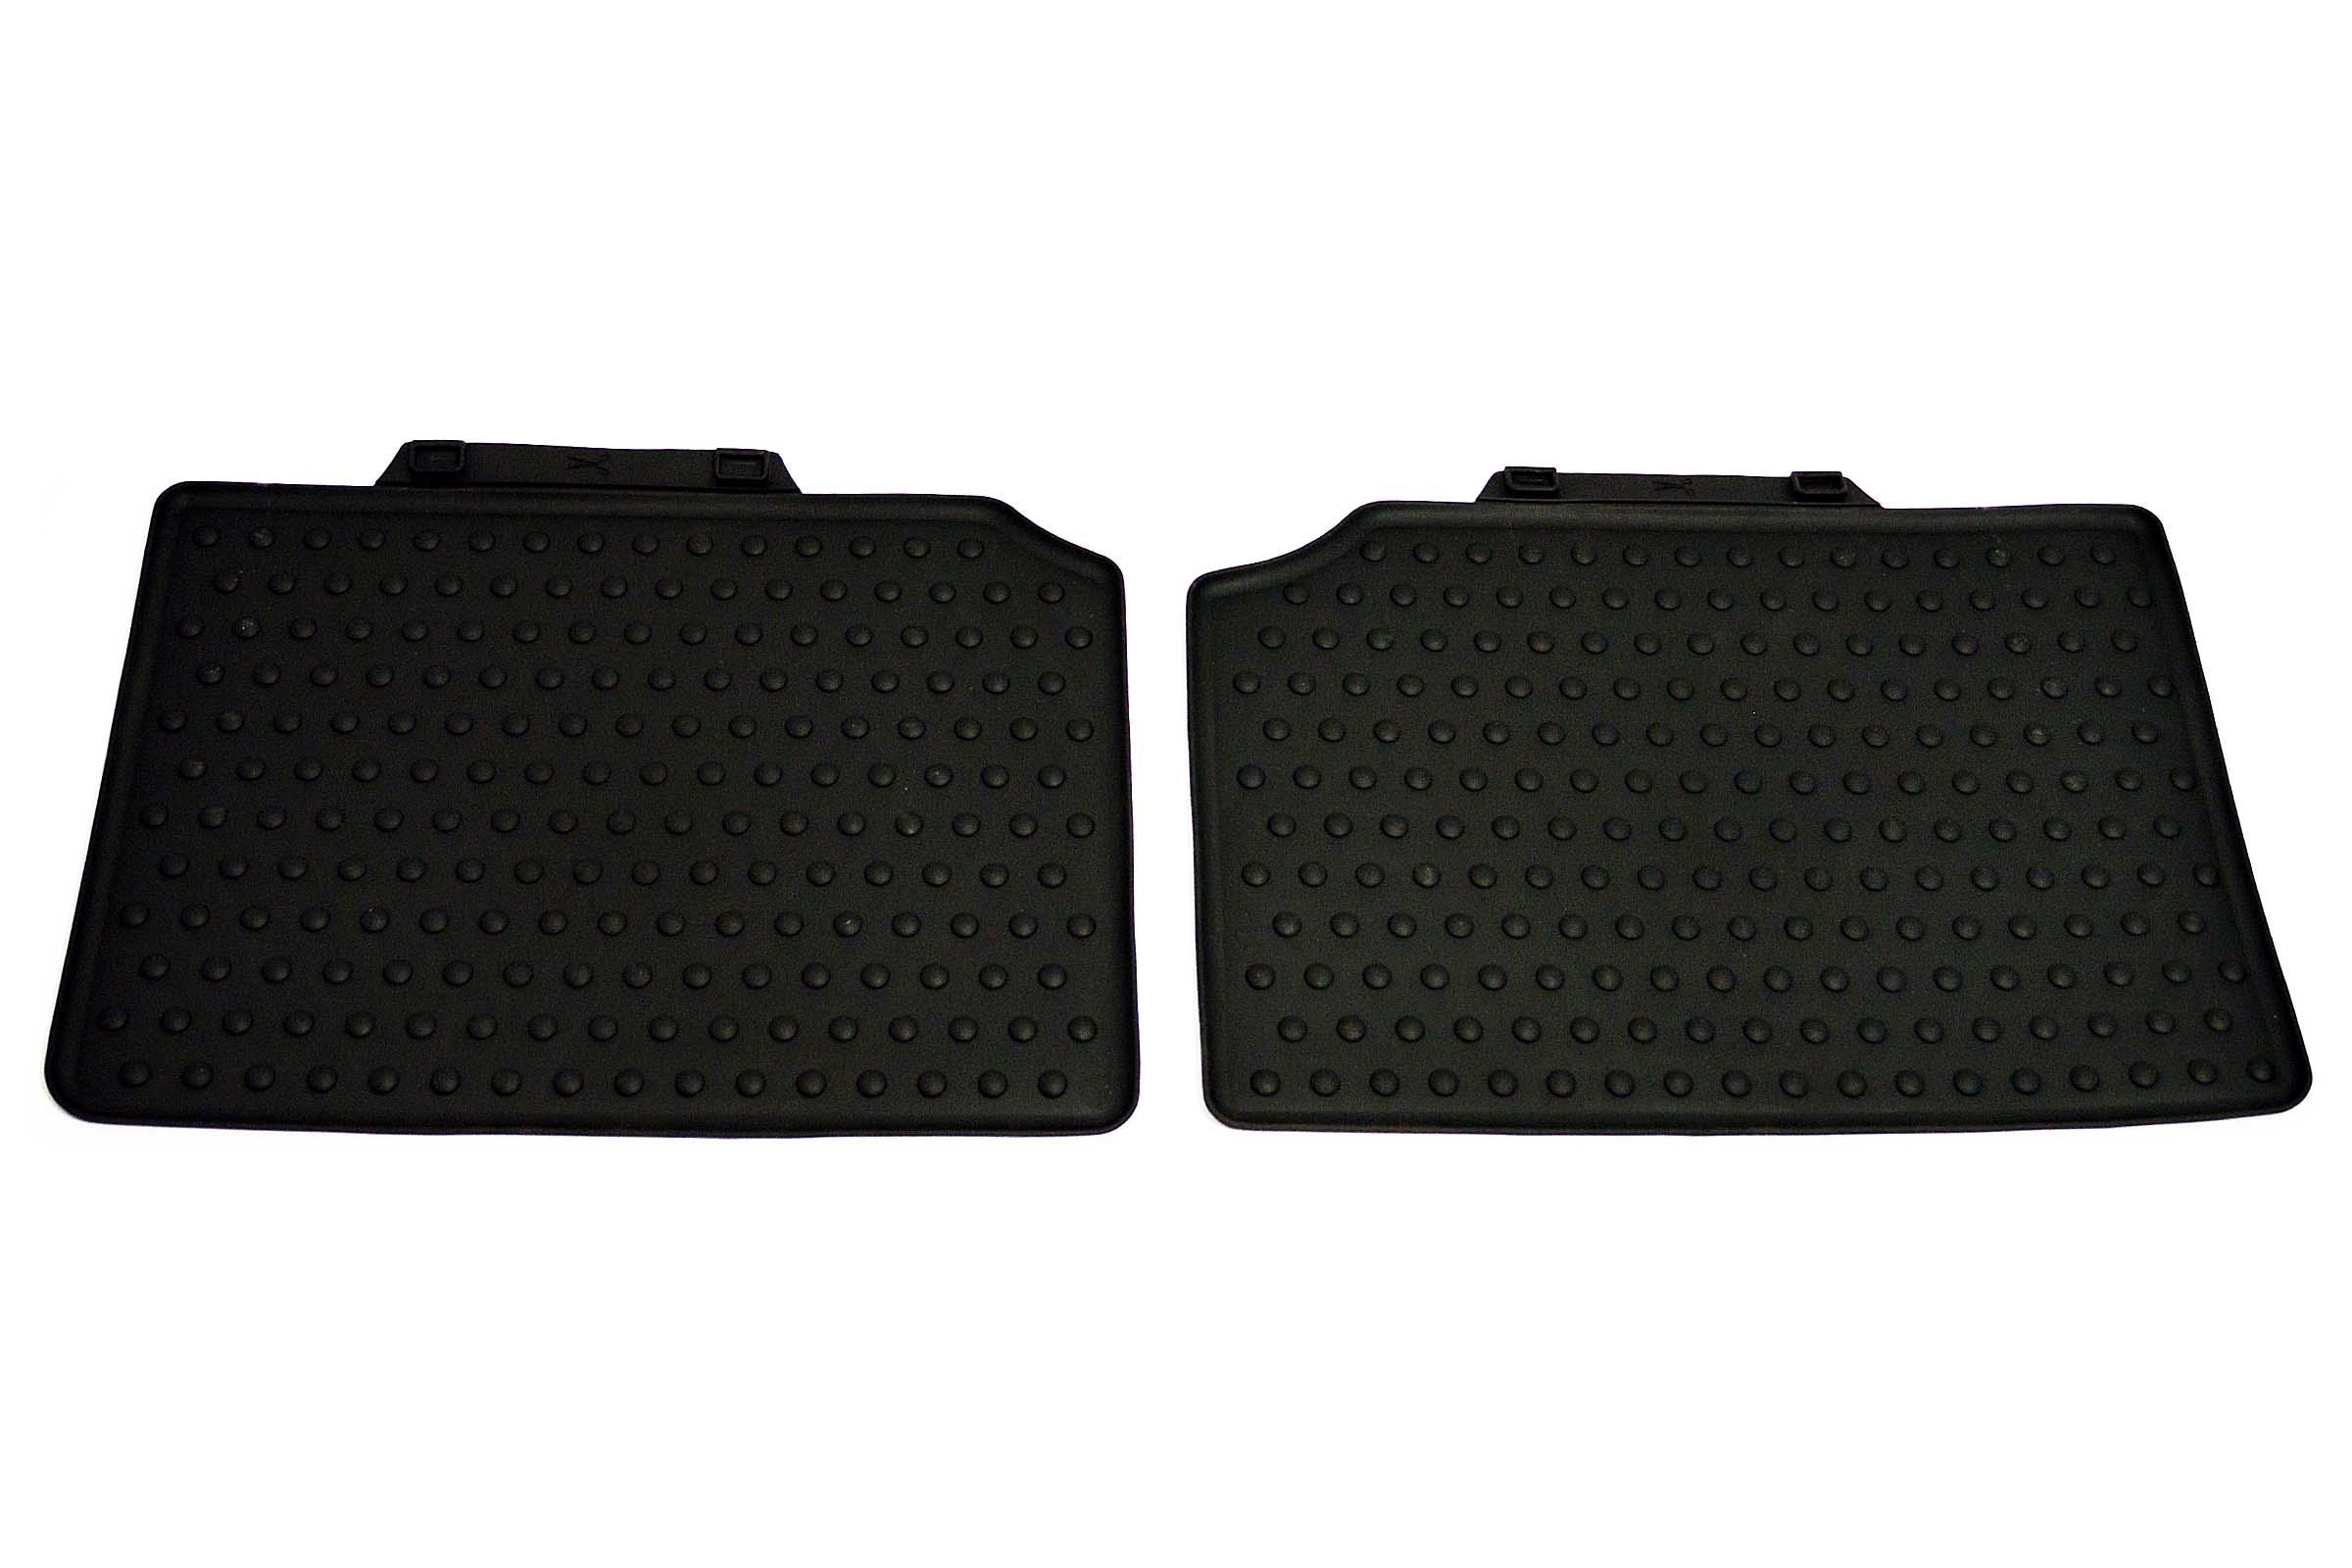 Mini cooper rubber floor mats uk - Mini Countryman Rear All Weather Rubber Floor Mats